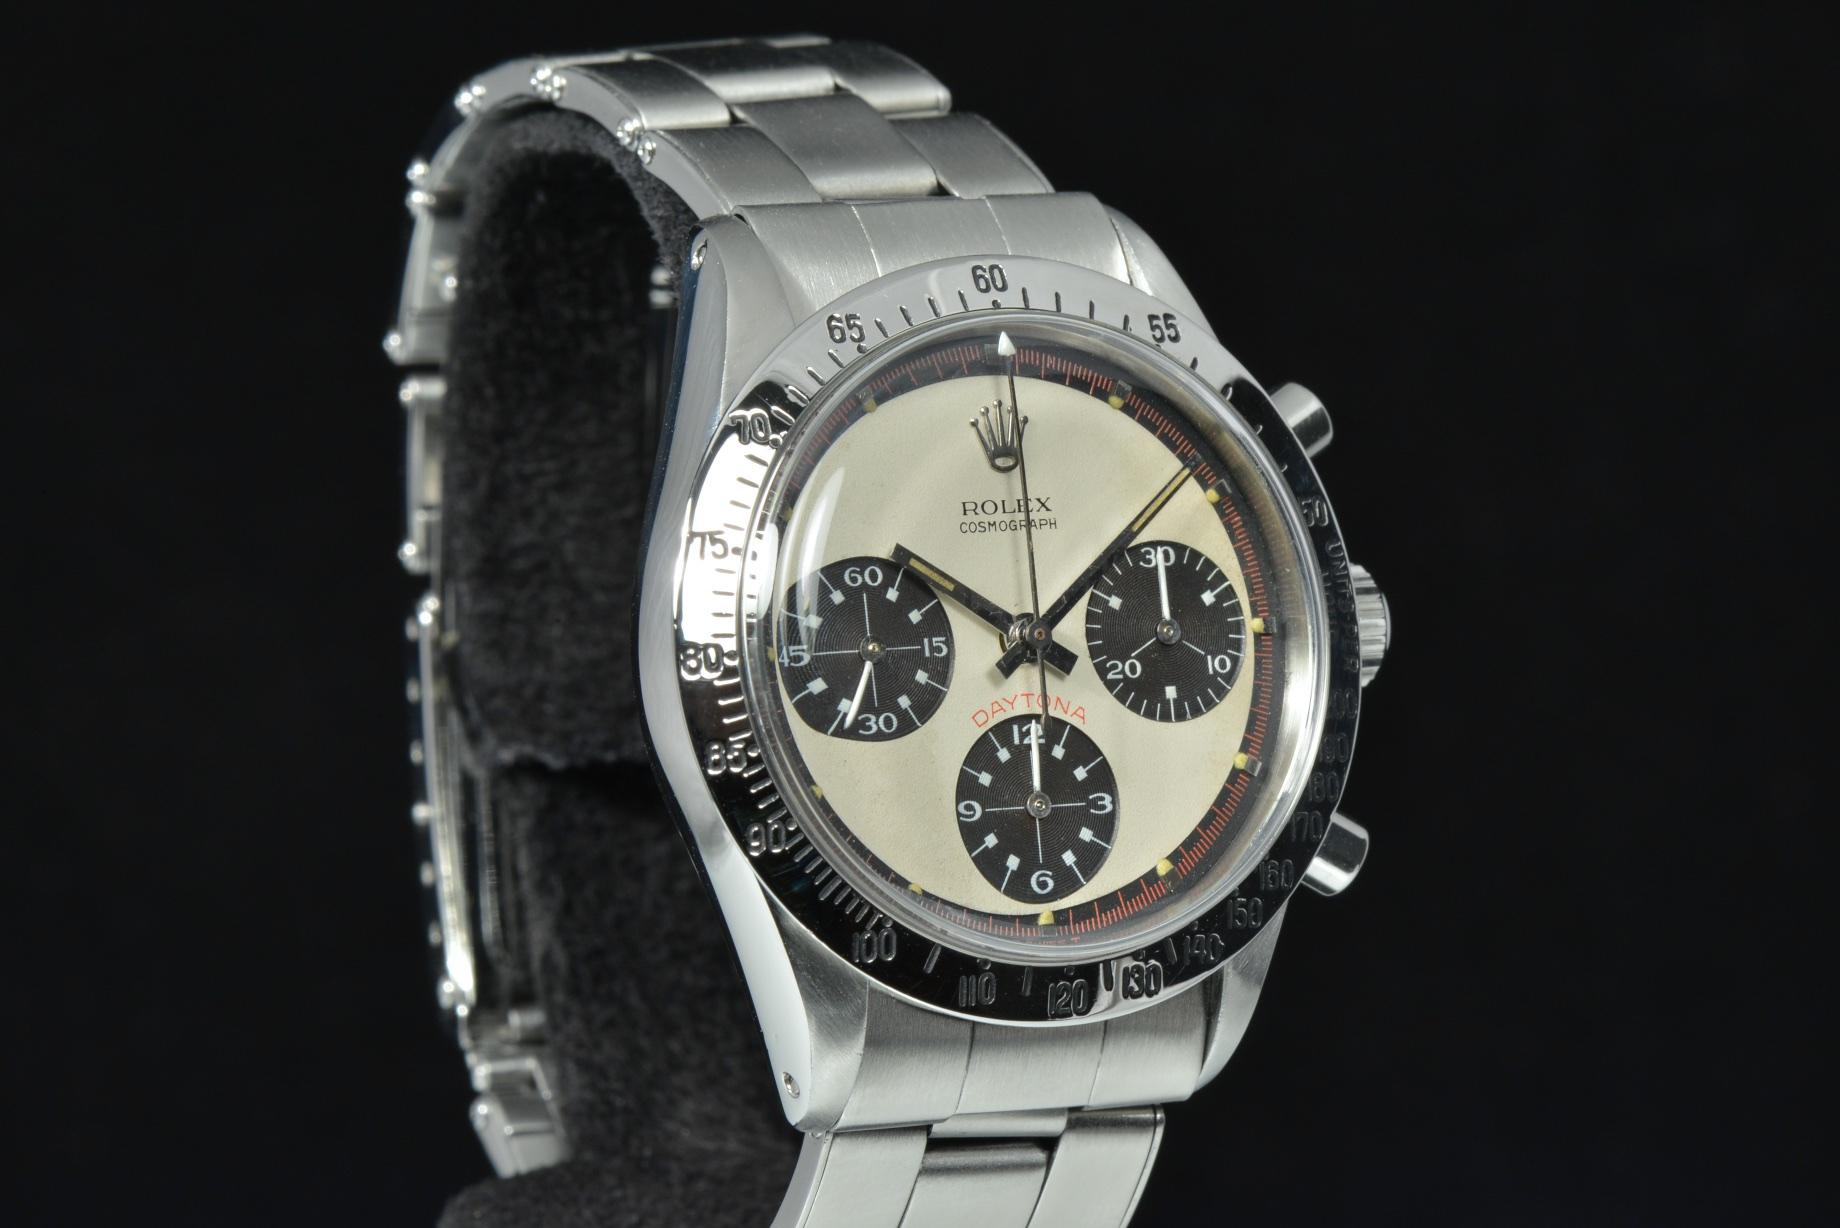 Rolex Daytona 6239 Quadrante Paul Newman